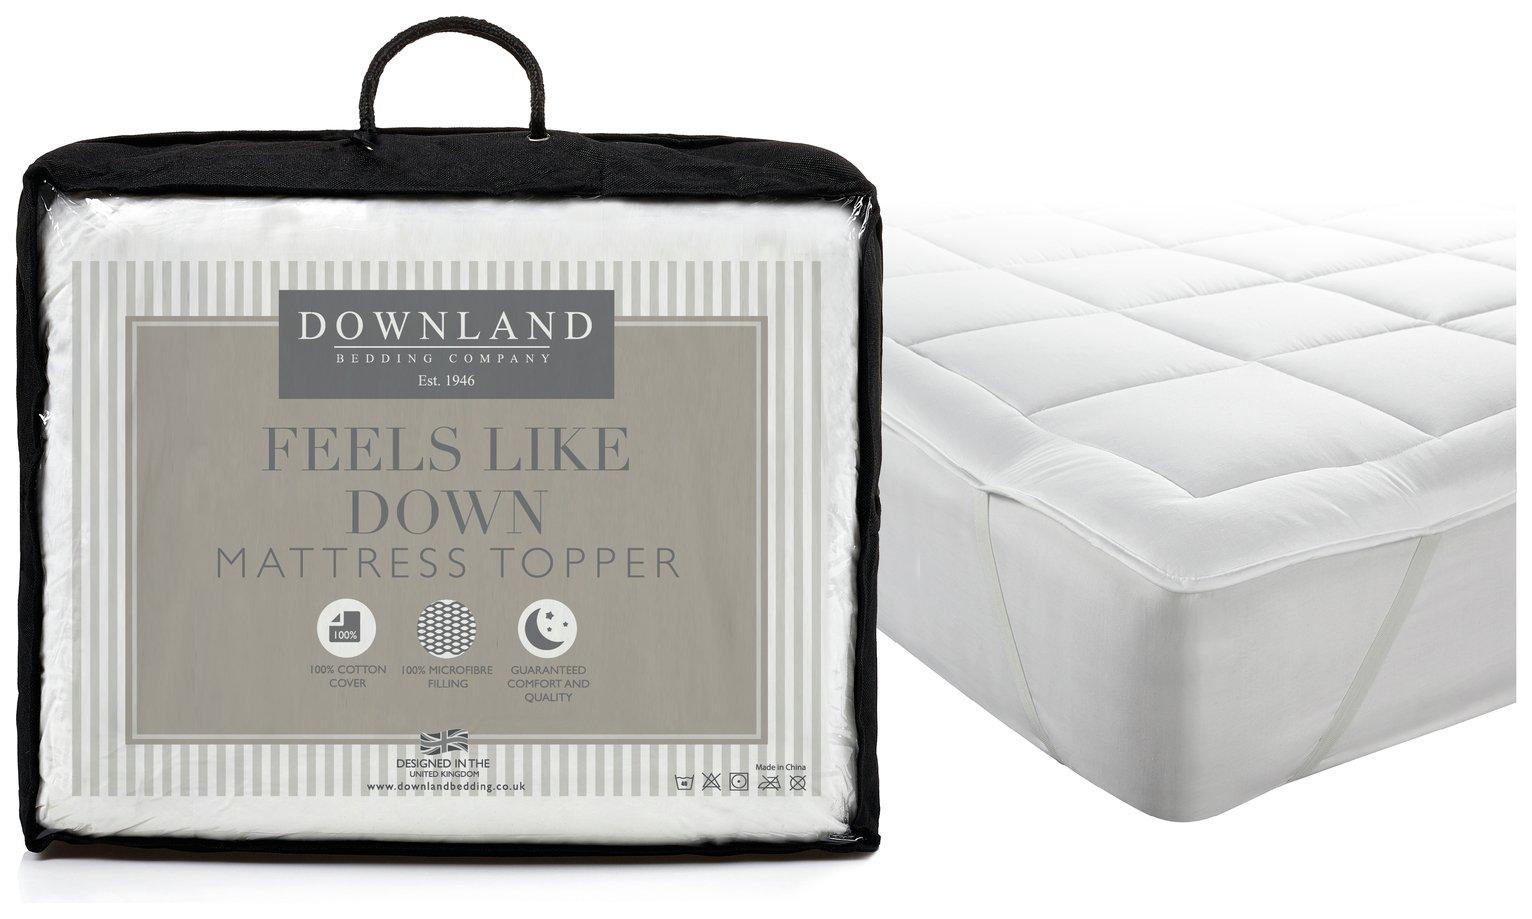 downland feels like down mattress topper